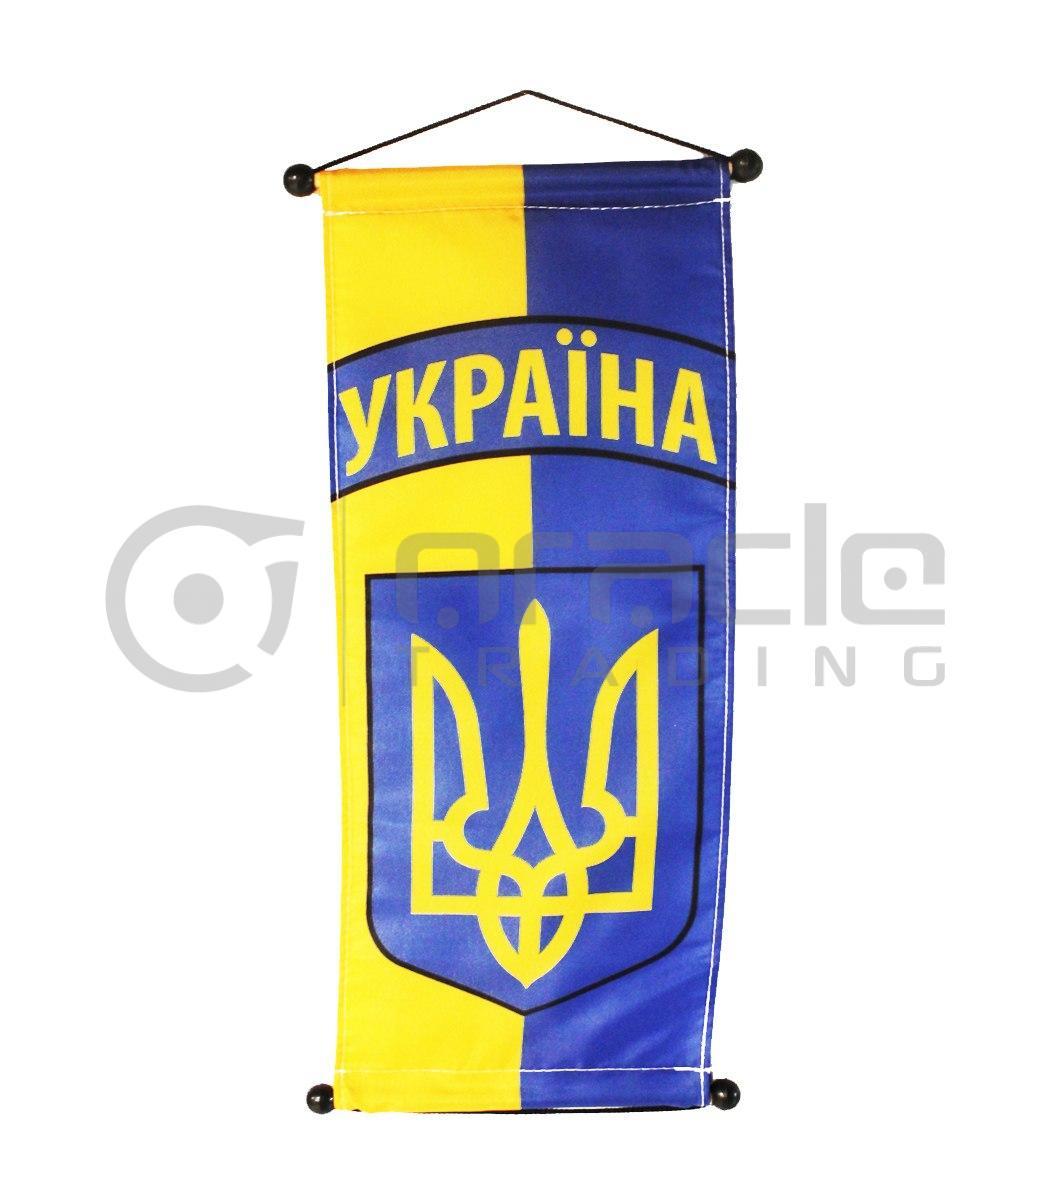 Ukraine Small Banner